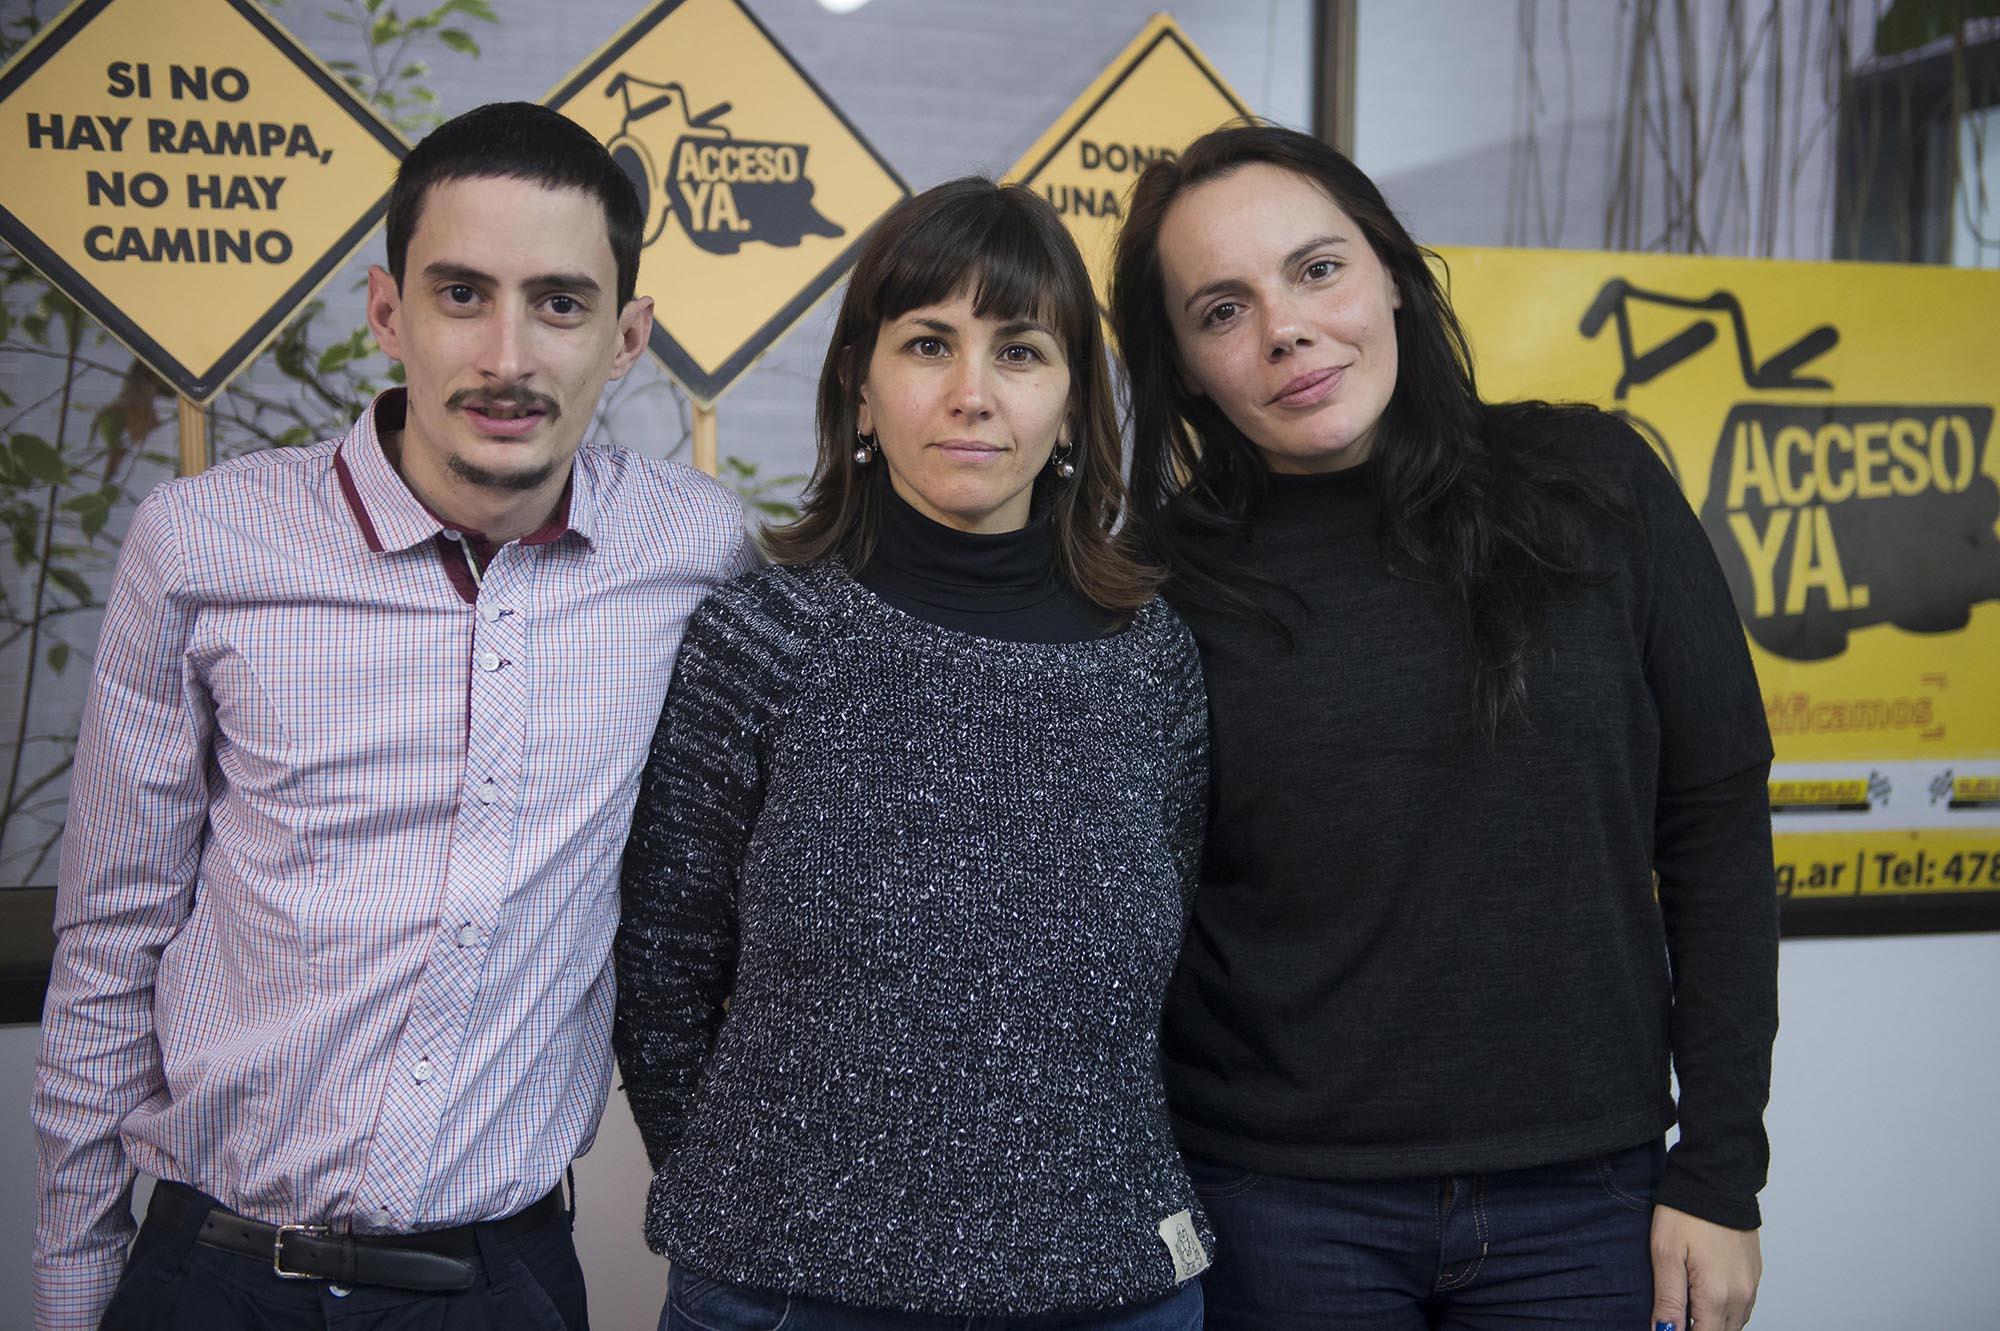 Eugenia Schonhaut (Directora Ejecutiva), Lilian Figueroa (abogada), Alejandro Bianchi (voluntario)